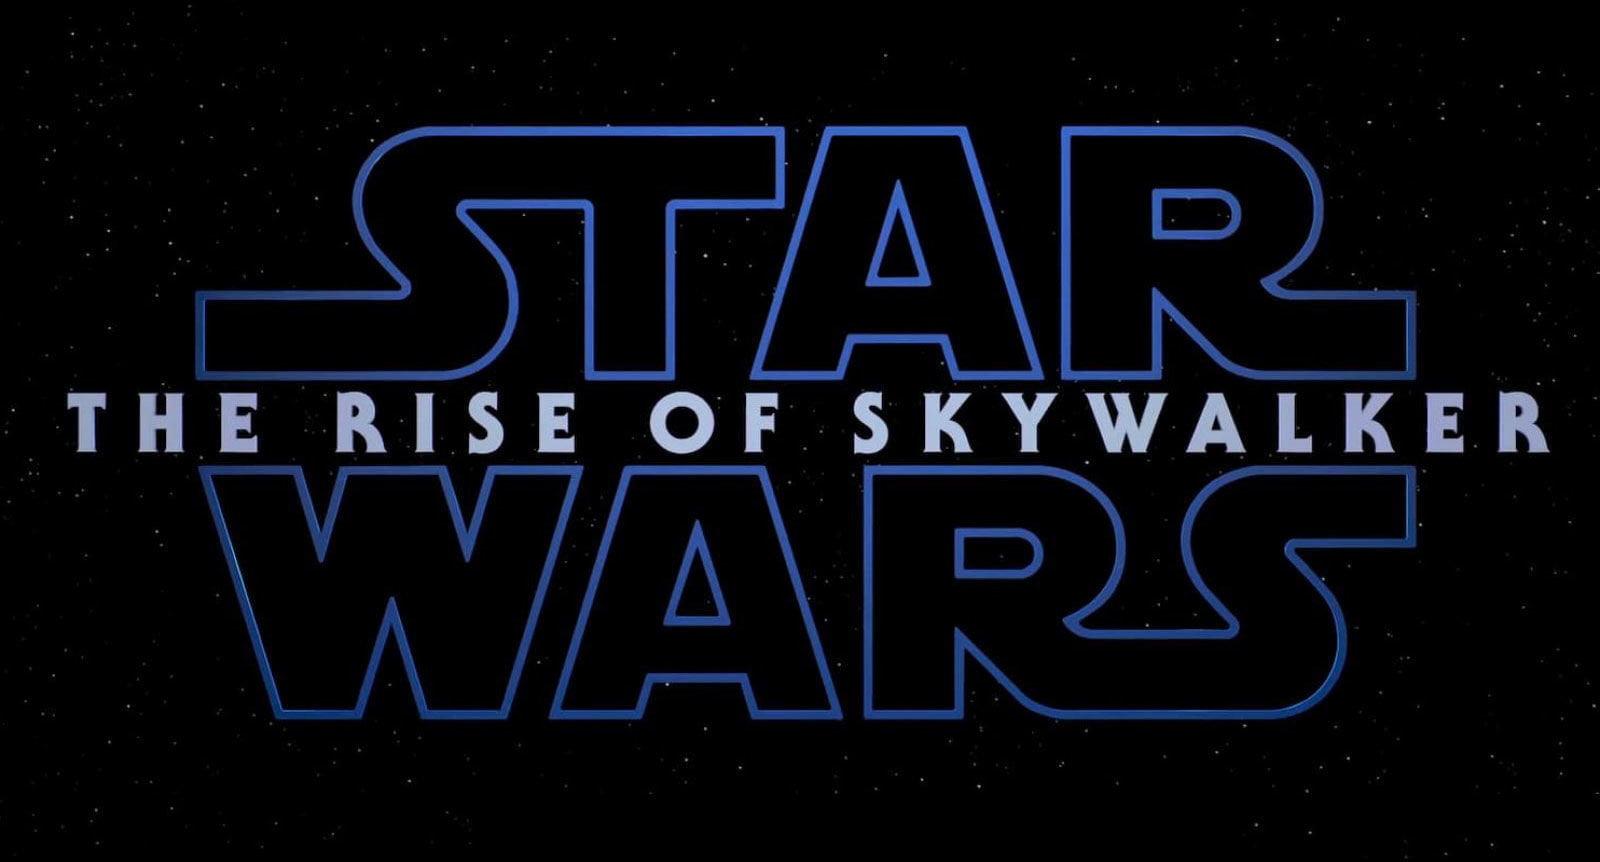 Star Wars The Rise Of Skywalker Episode 9 Trading Cards Value Box 5 Packs 3 Exclusive Cards Walmart Com Walmart Com